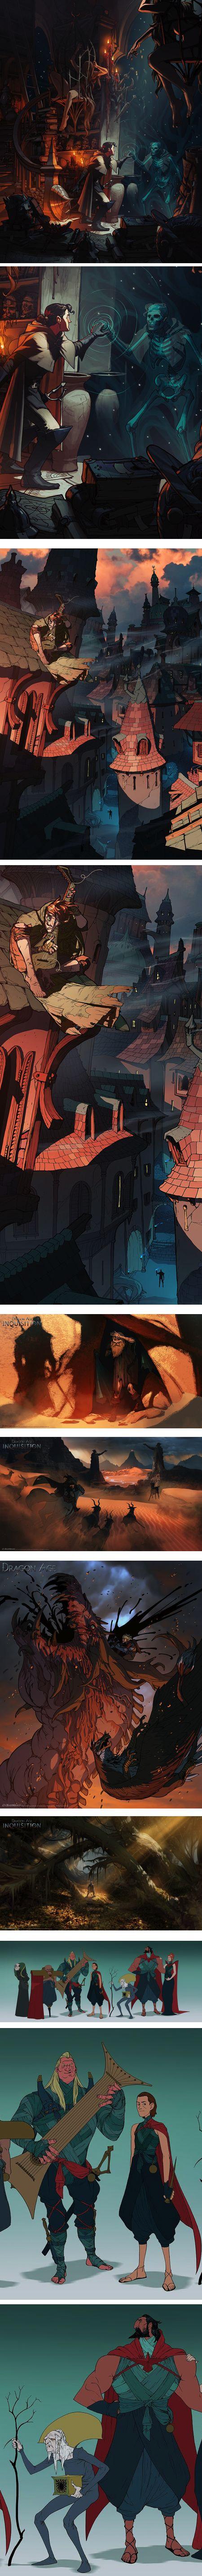 Matt Rhodes is lead concept artist on Dragon Age: Inquisition at Bioware